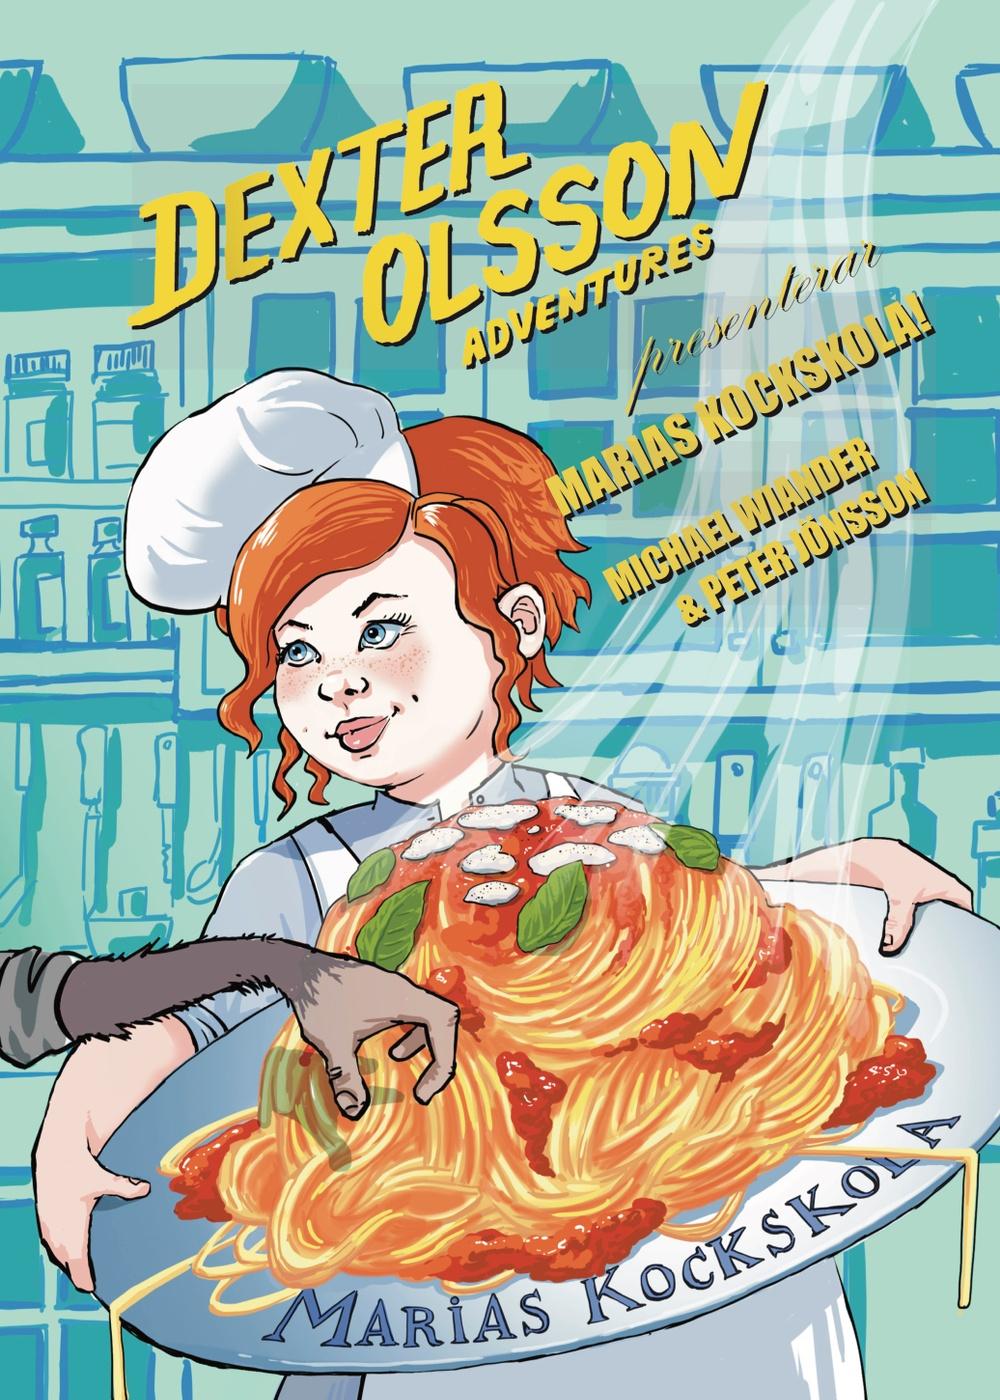 Bokomslag: Marias kockskola